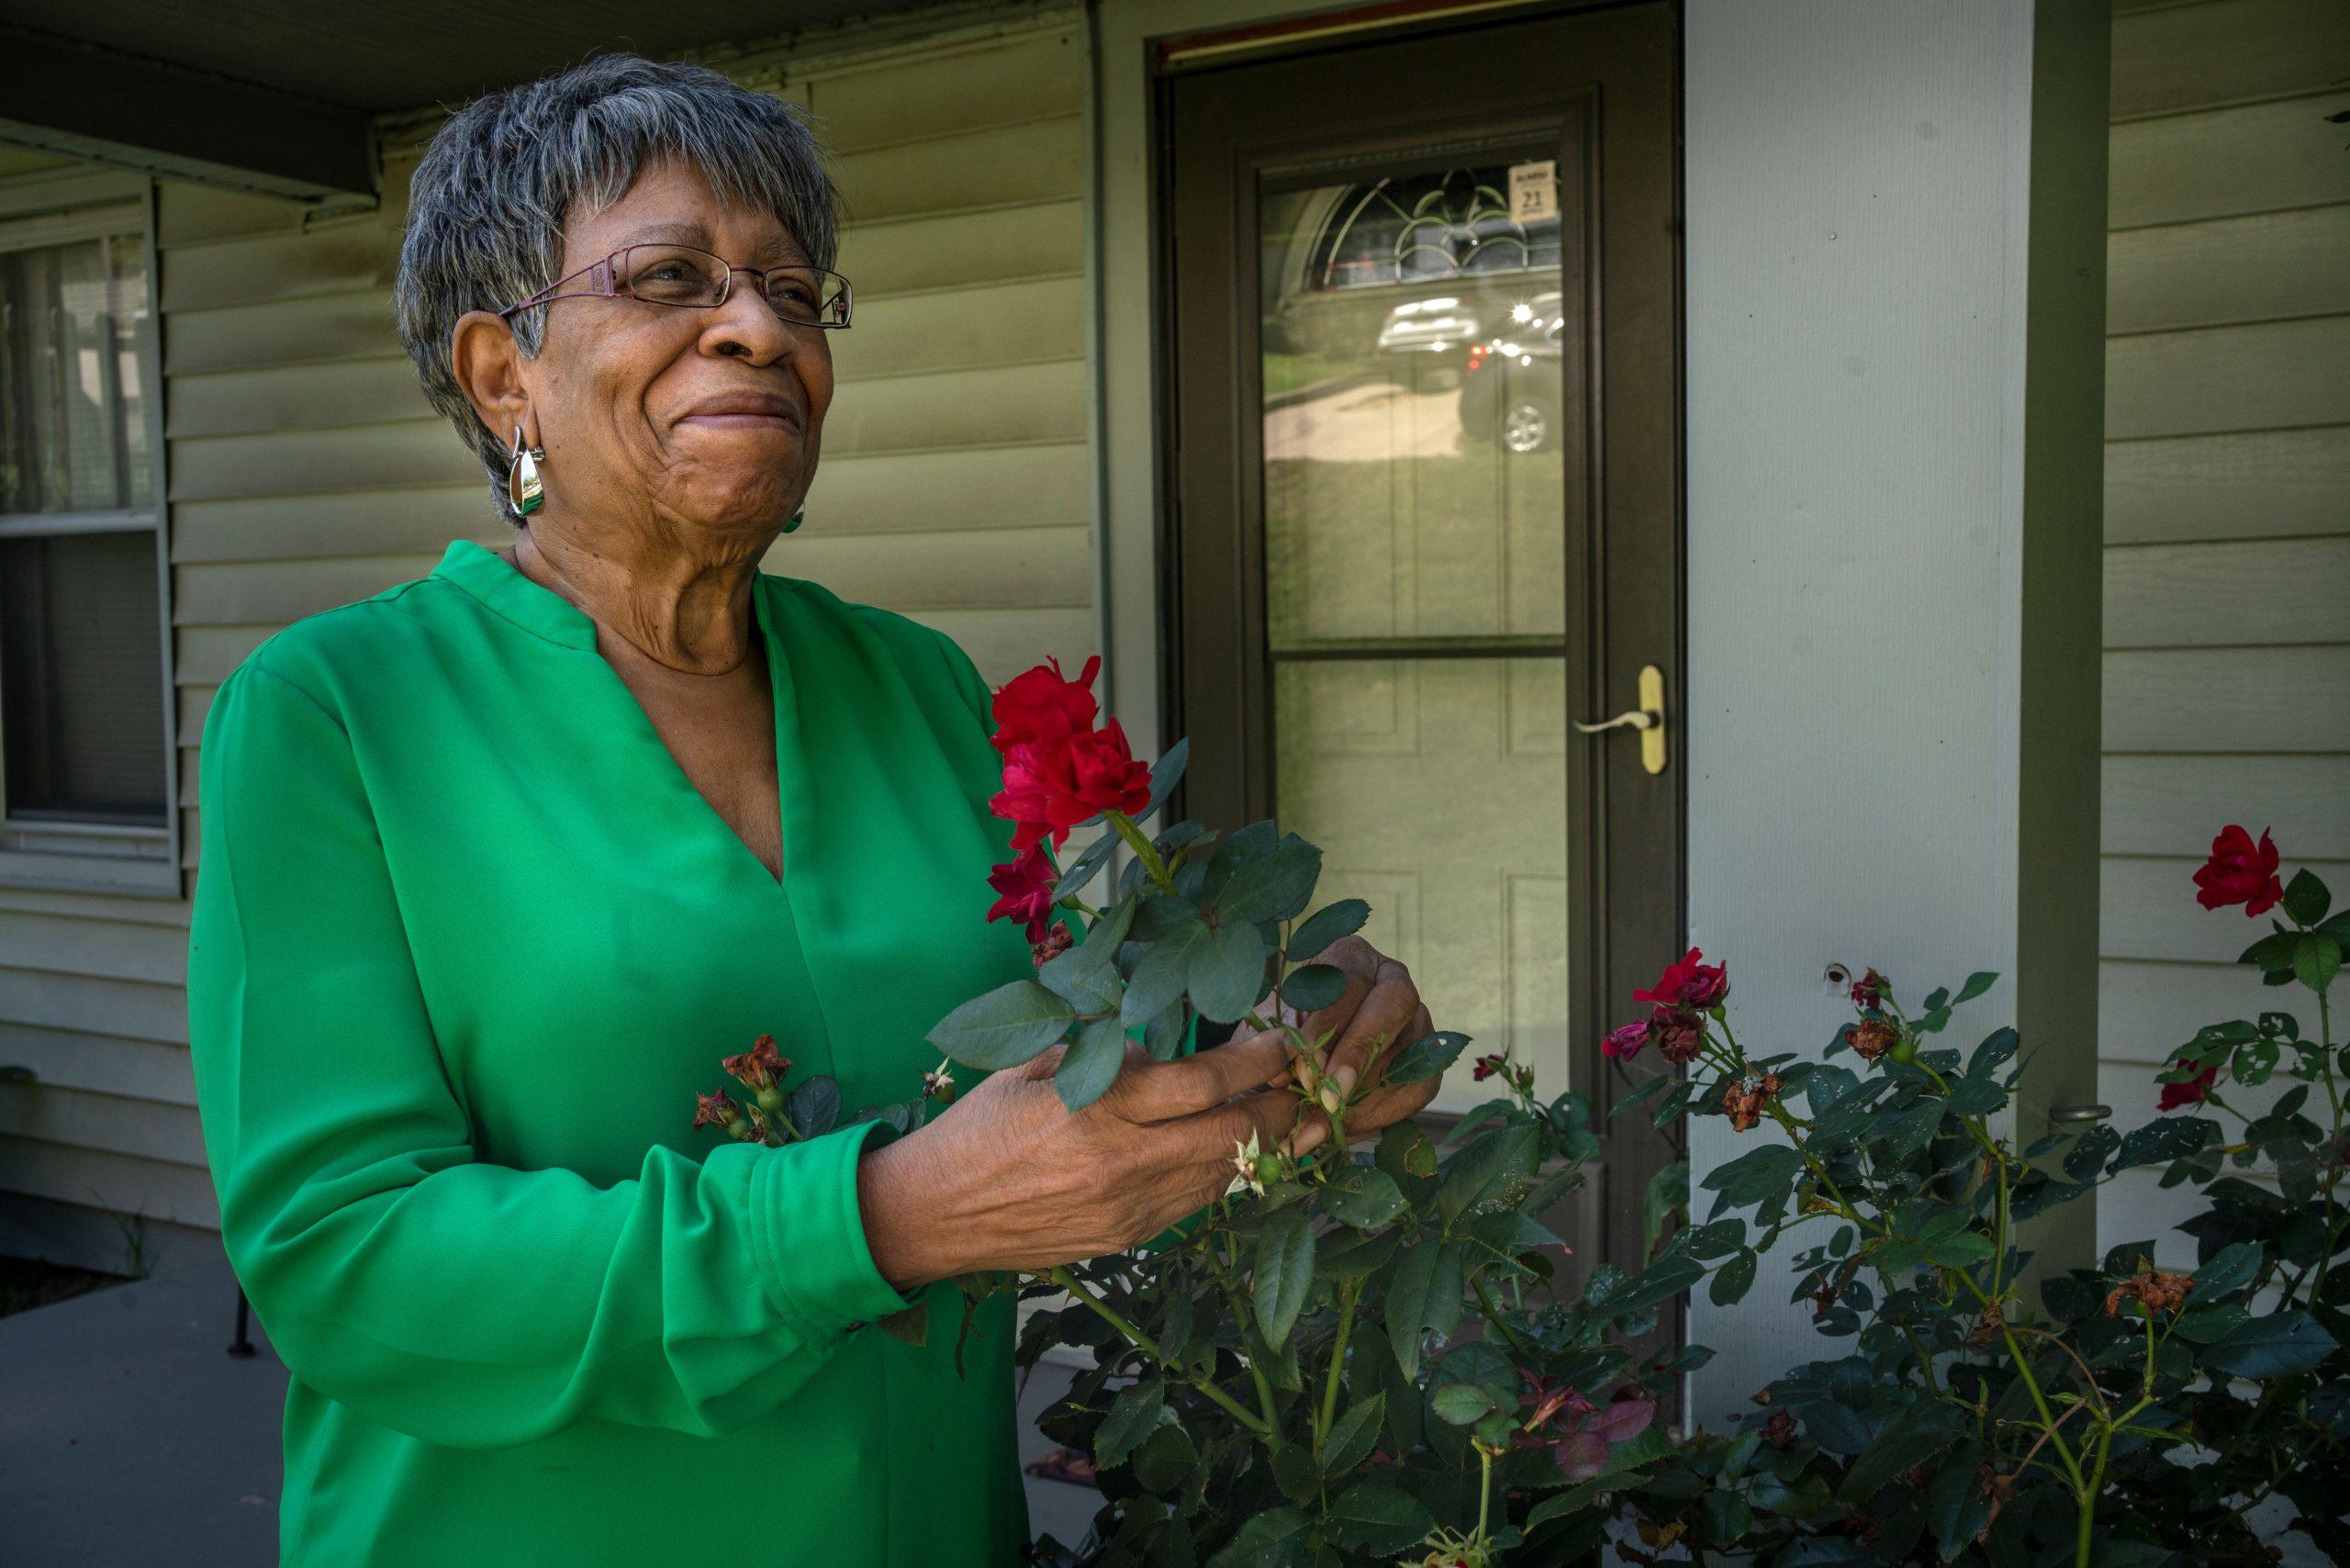 Mary Jean Smith outside her North Nashville home. (Photo: John Partipilo)